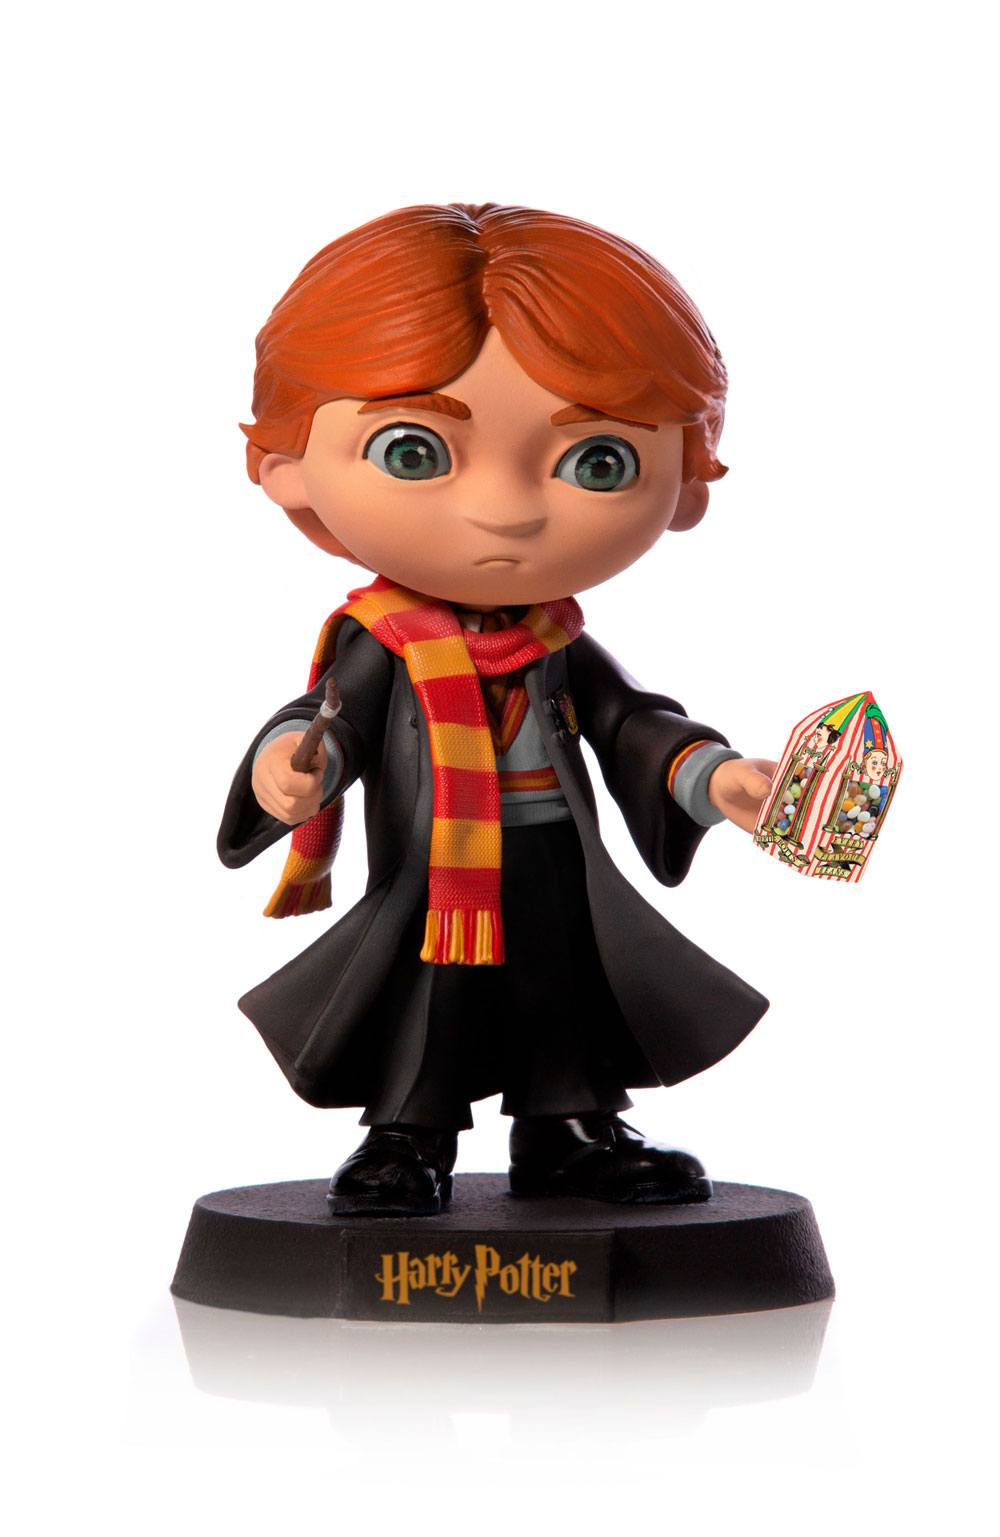 Harry Potter - Mini Co : Figurine Ron Weasley